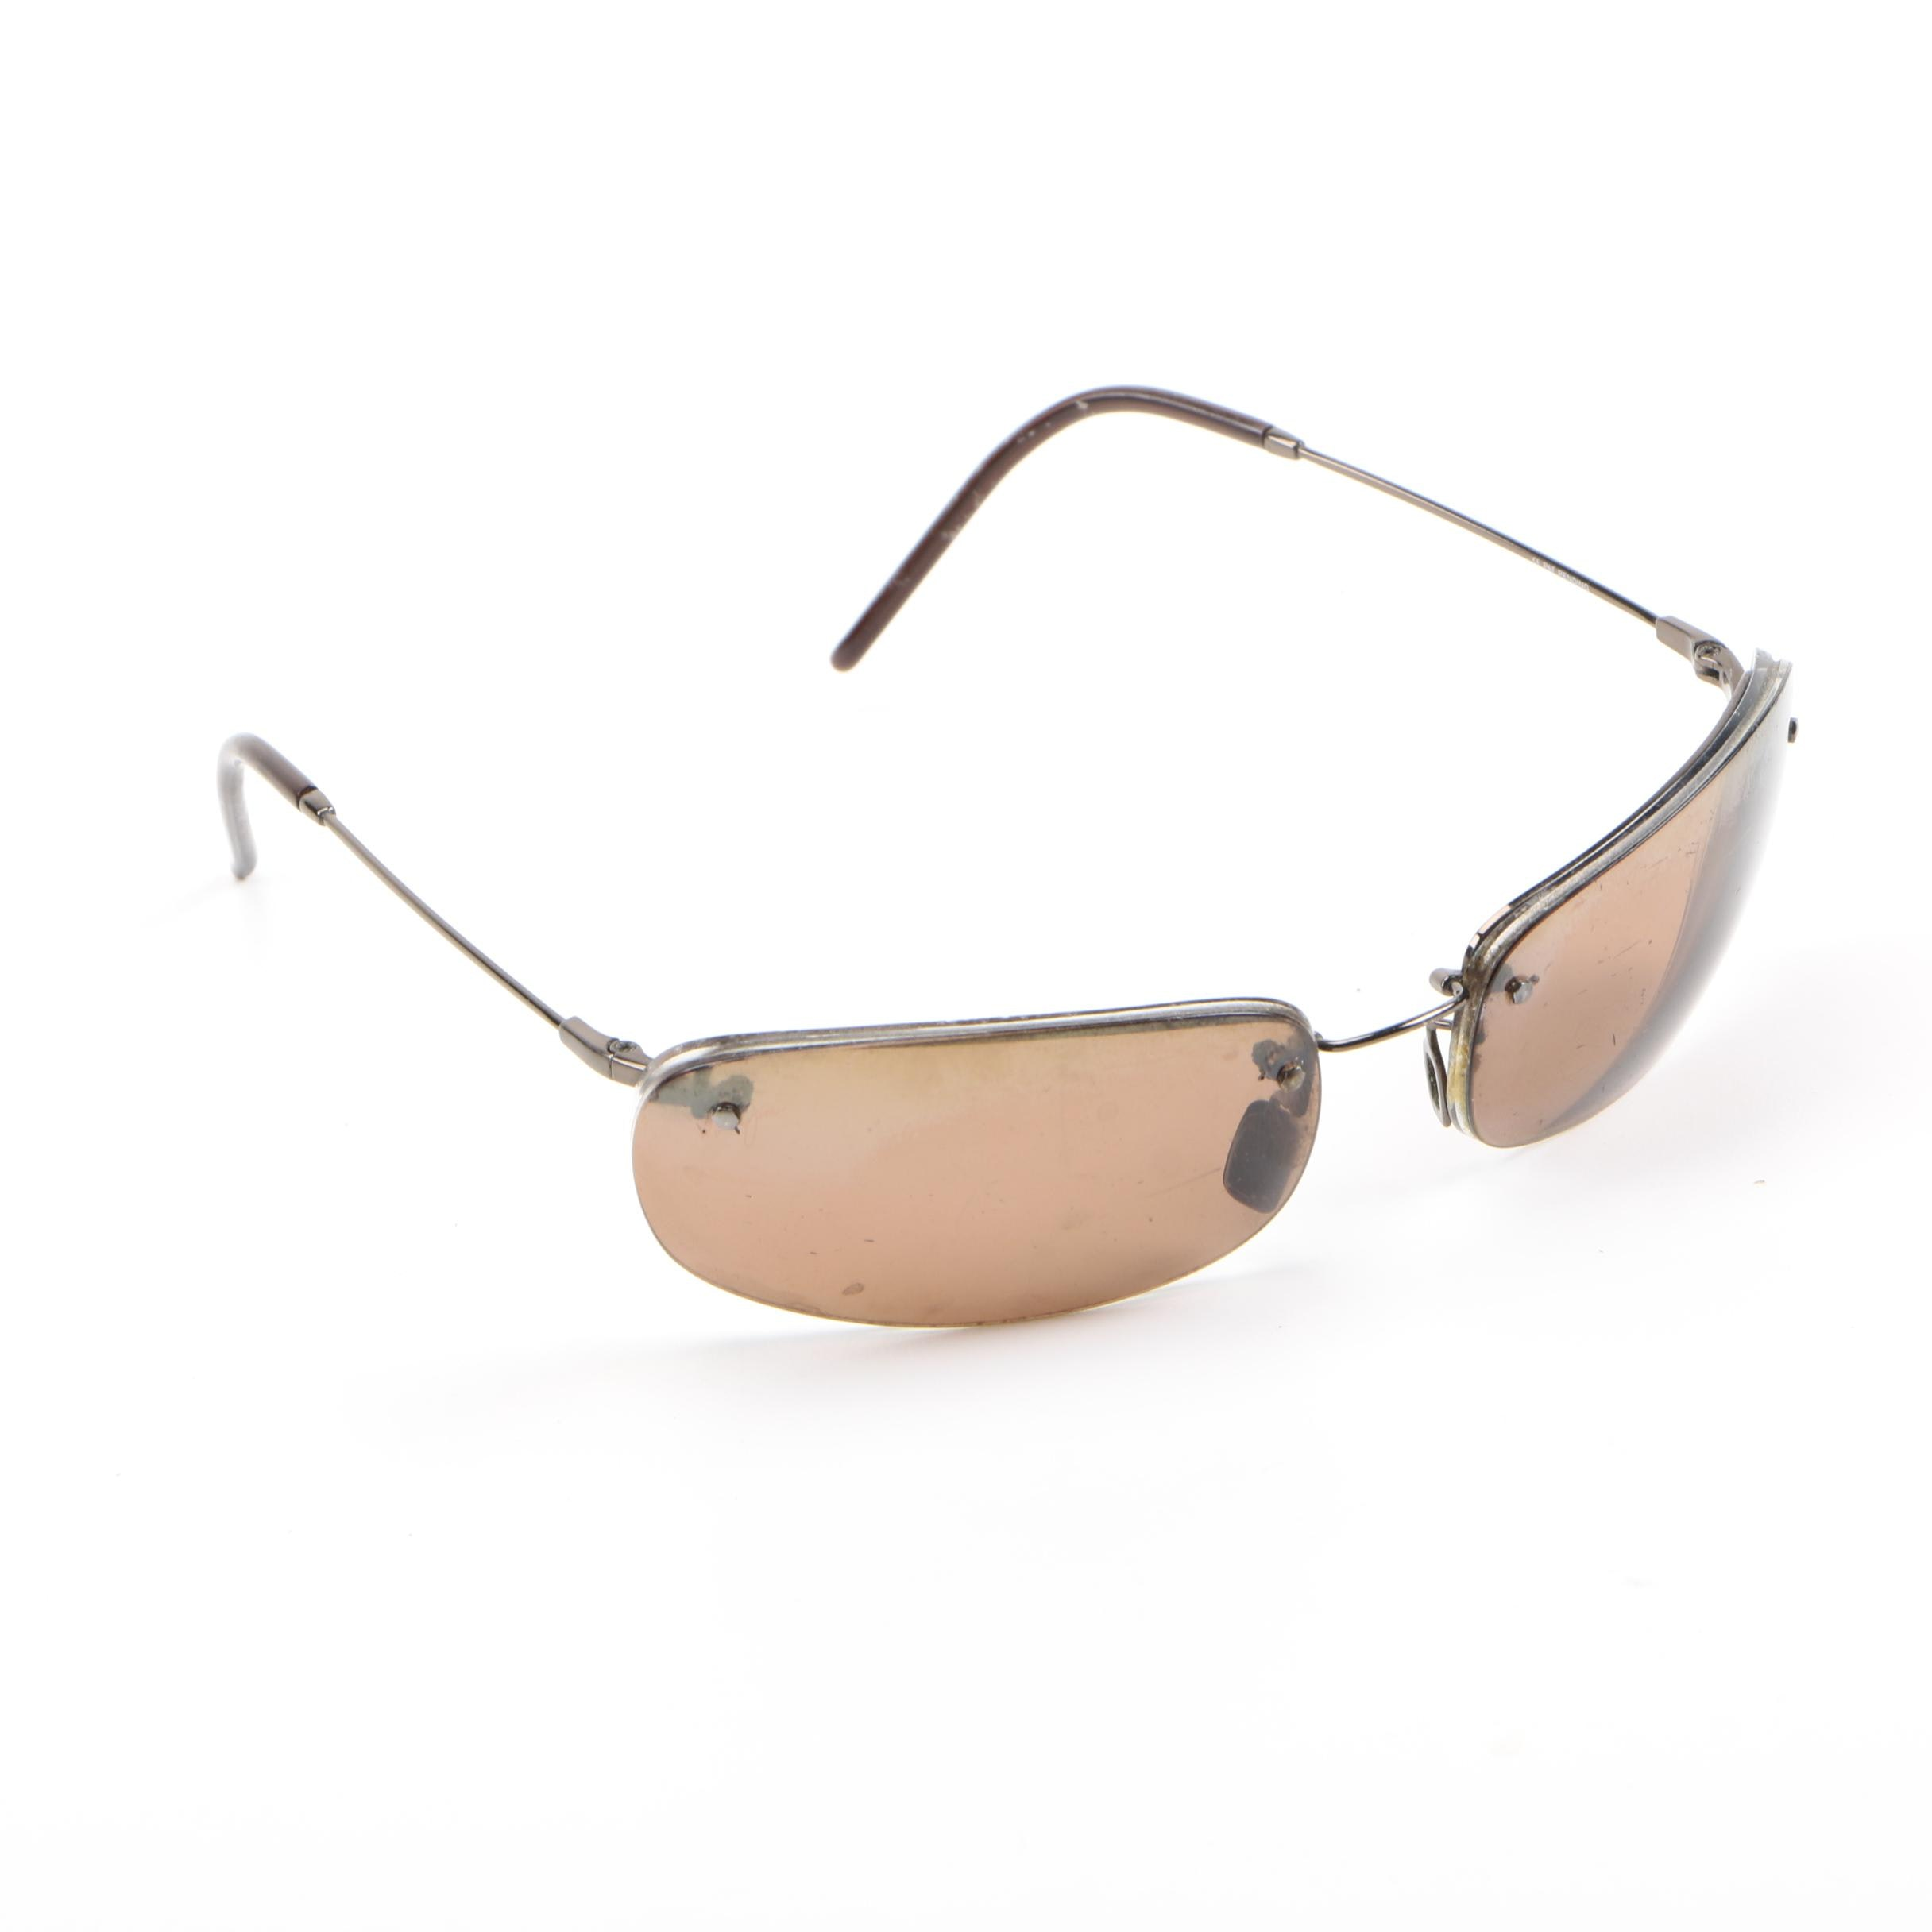 Prescription Maui Jim Rimless Sunglasses